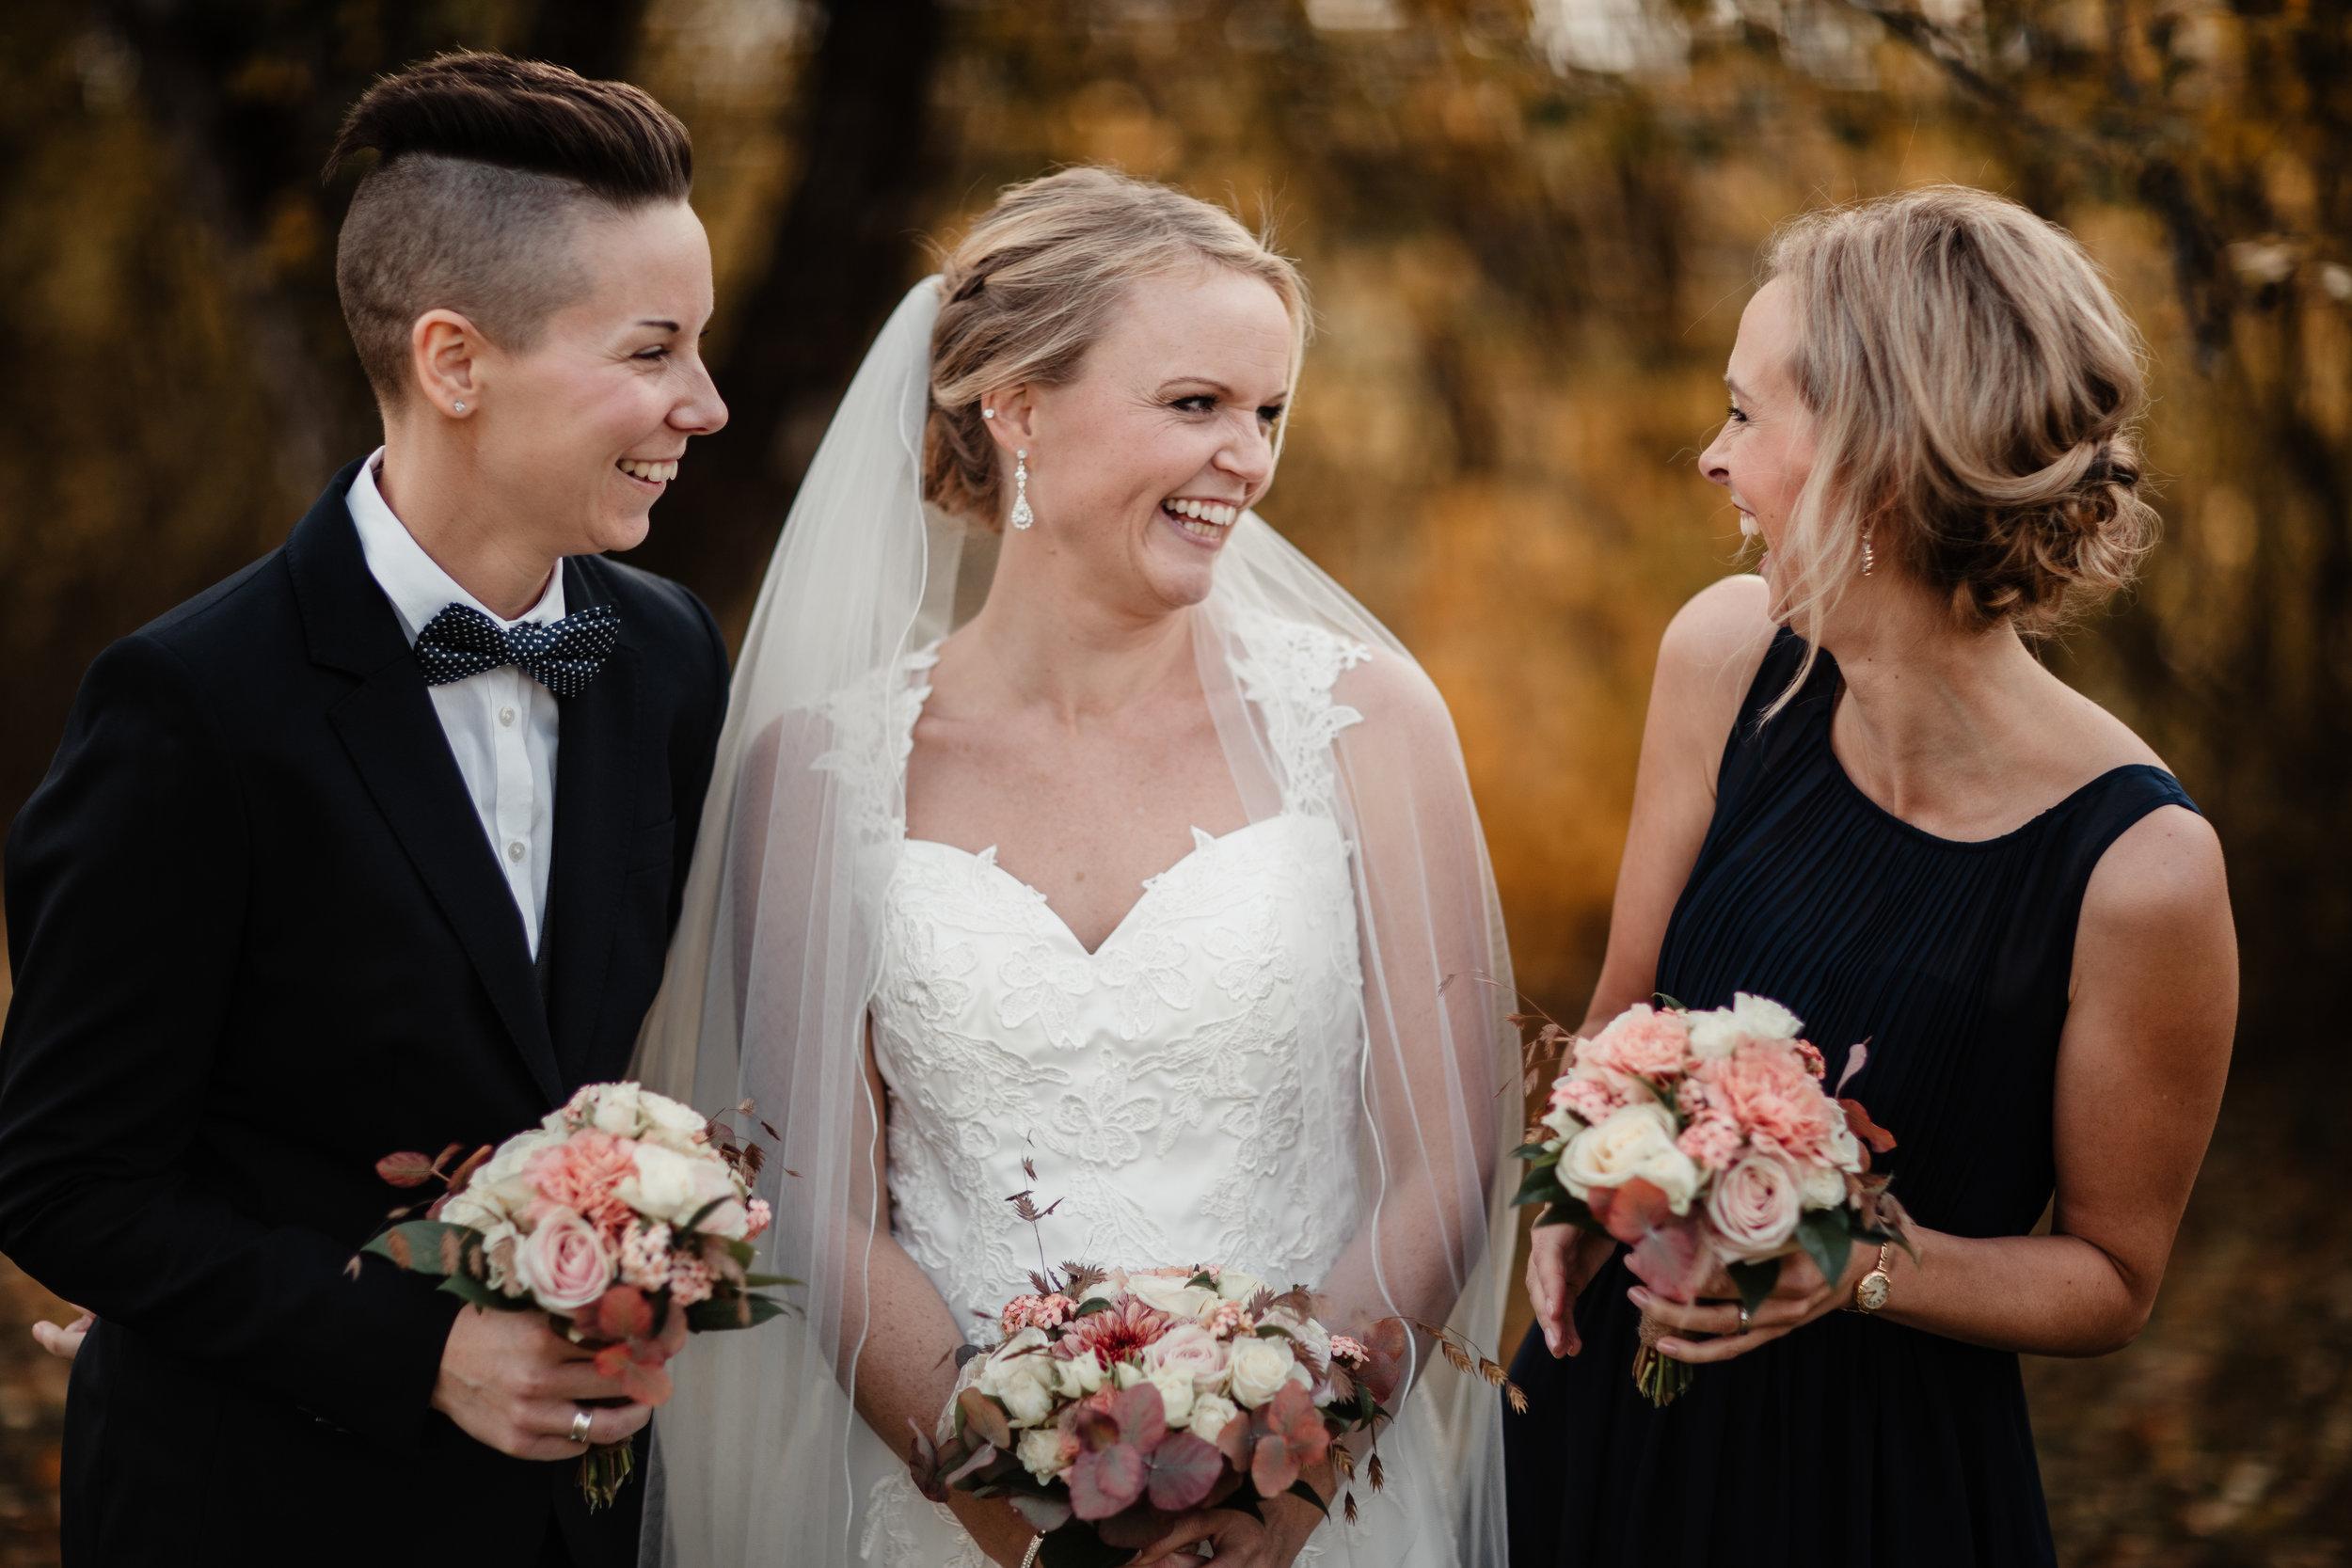 Bröllopsfotograf-Uddetorp Säteri-Höstbröllop-Fotograf Emilia- Bröllopsfotograf Borås-25.jpg